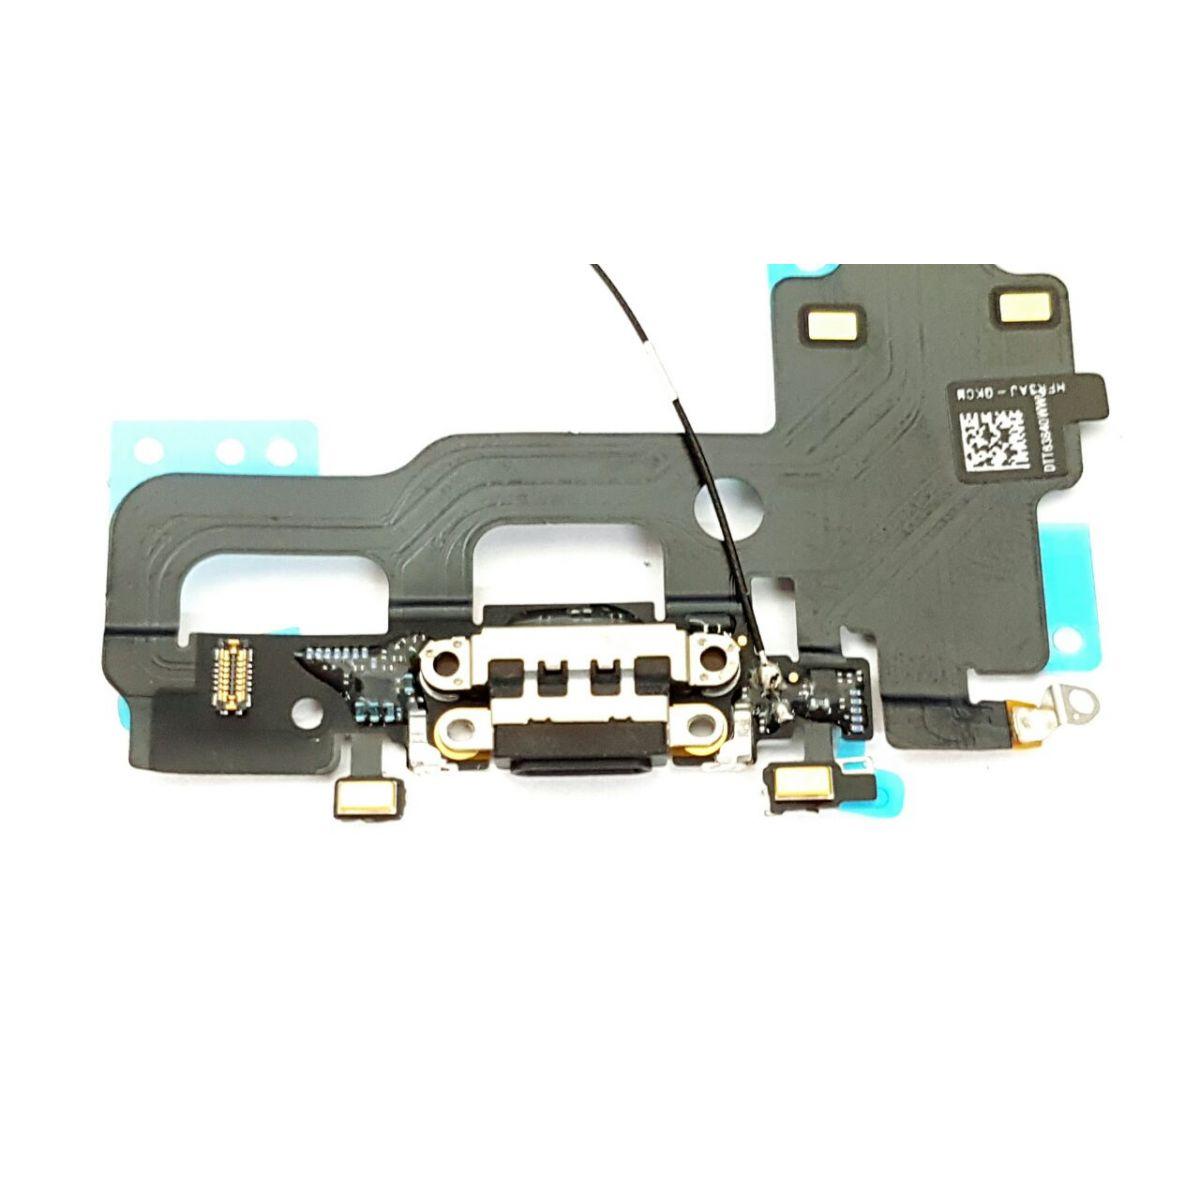 FLEX CONECTOR DOCK CARGA APPLE IPHONE 7 A1778  PRETO RETIRADA